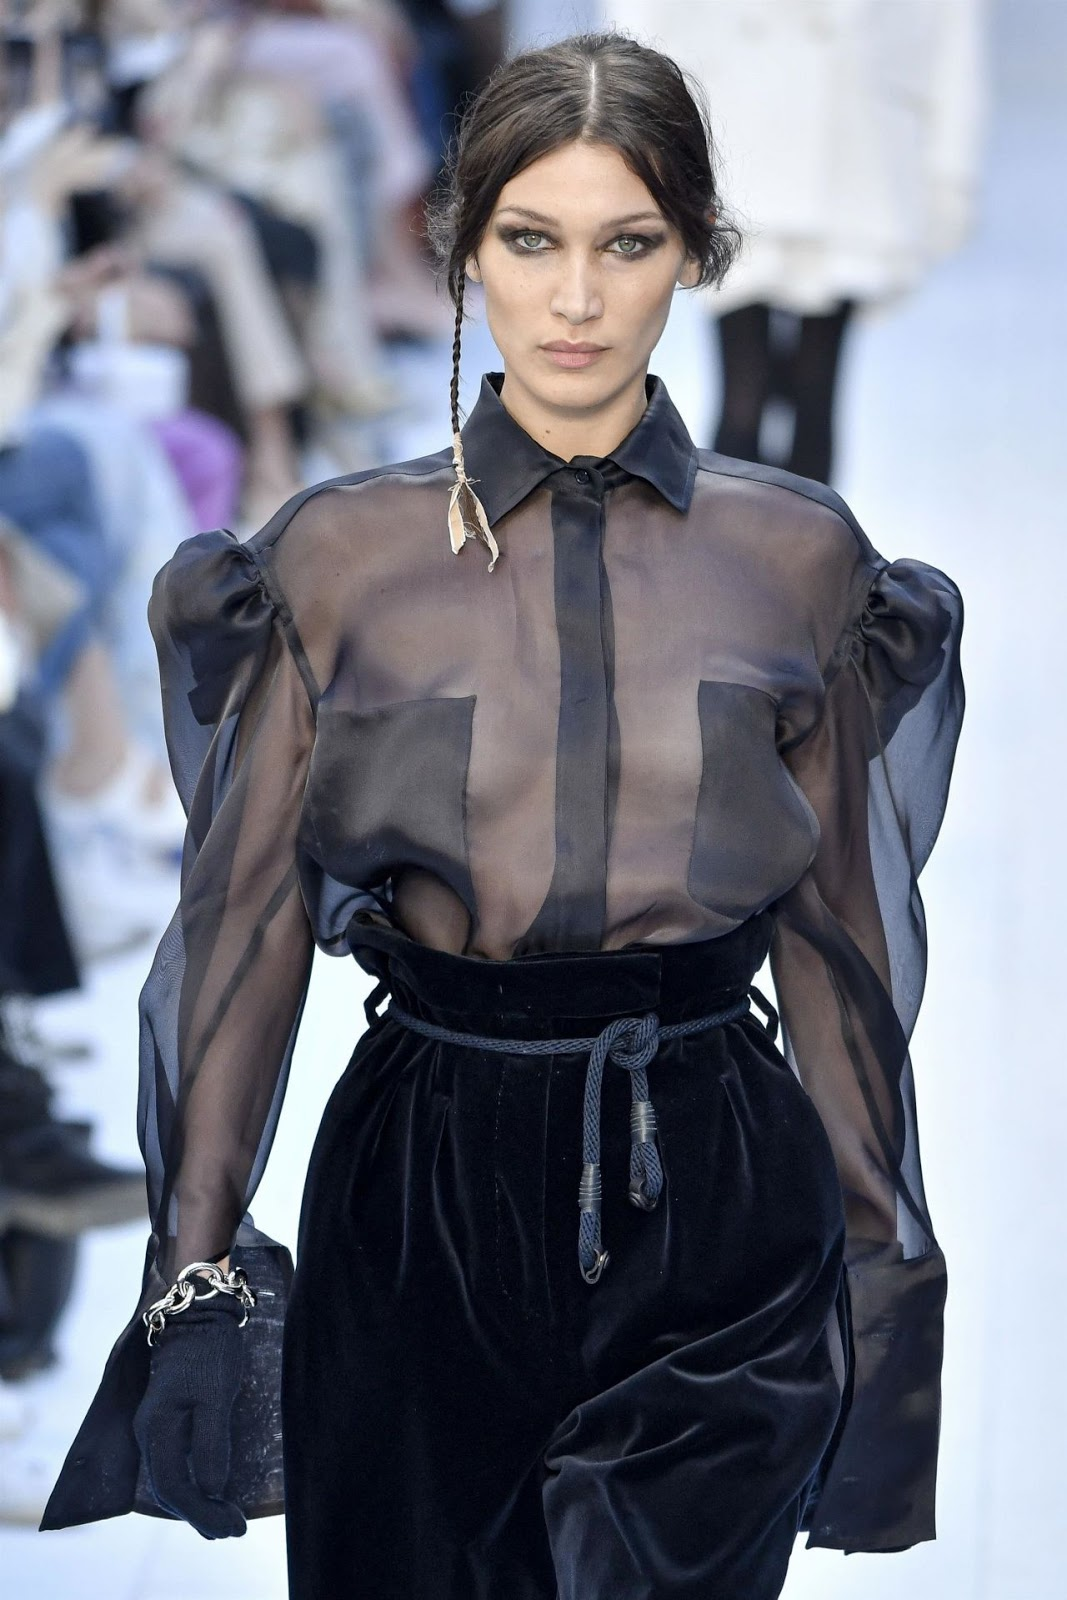 Braless Bella Hadid Wows Spectators at Milan Fashion Week With Daring Outfit